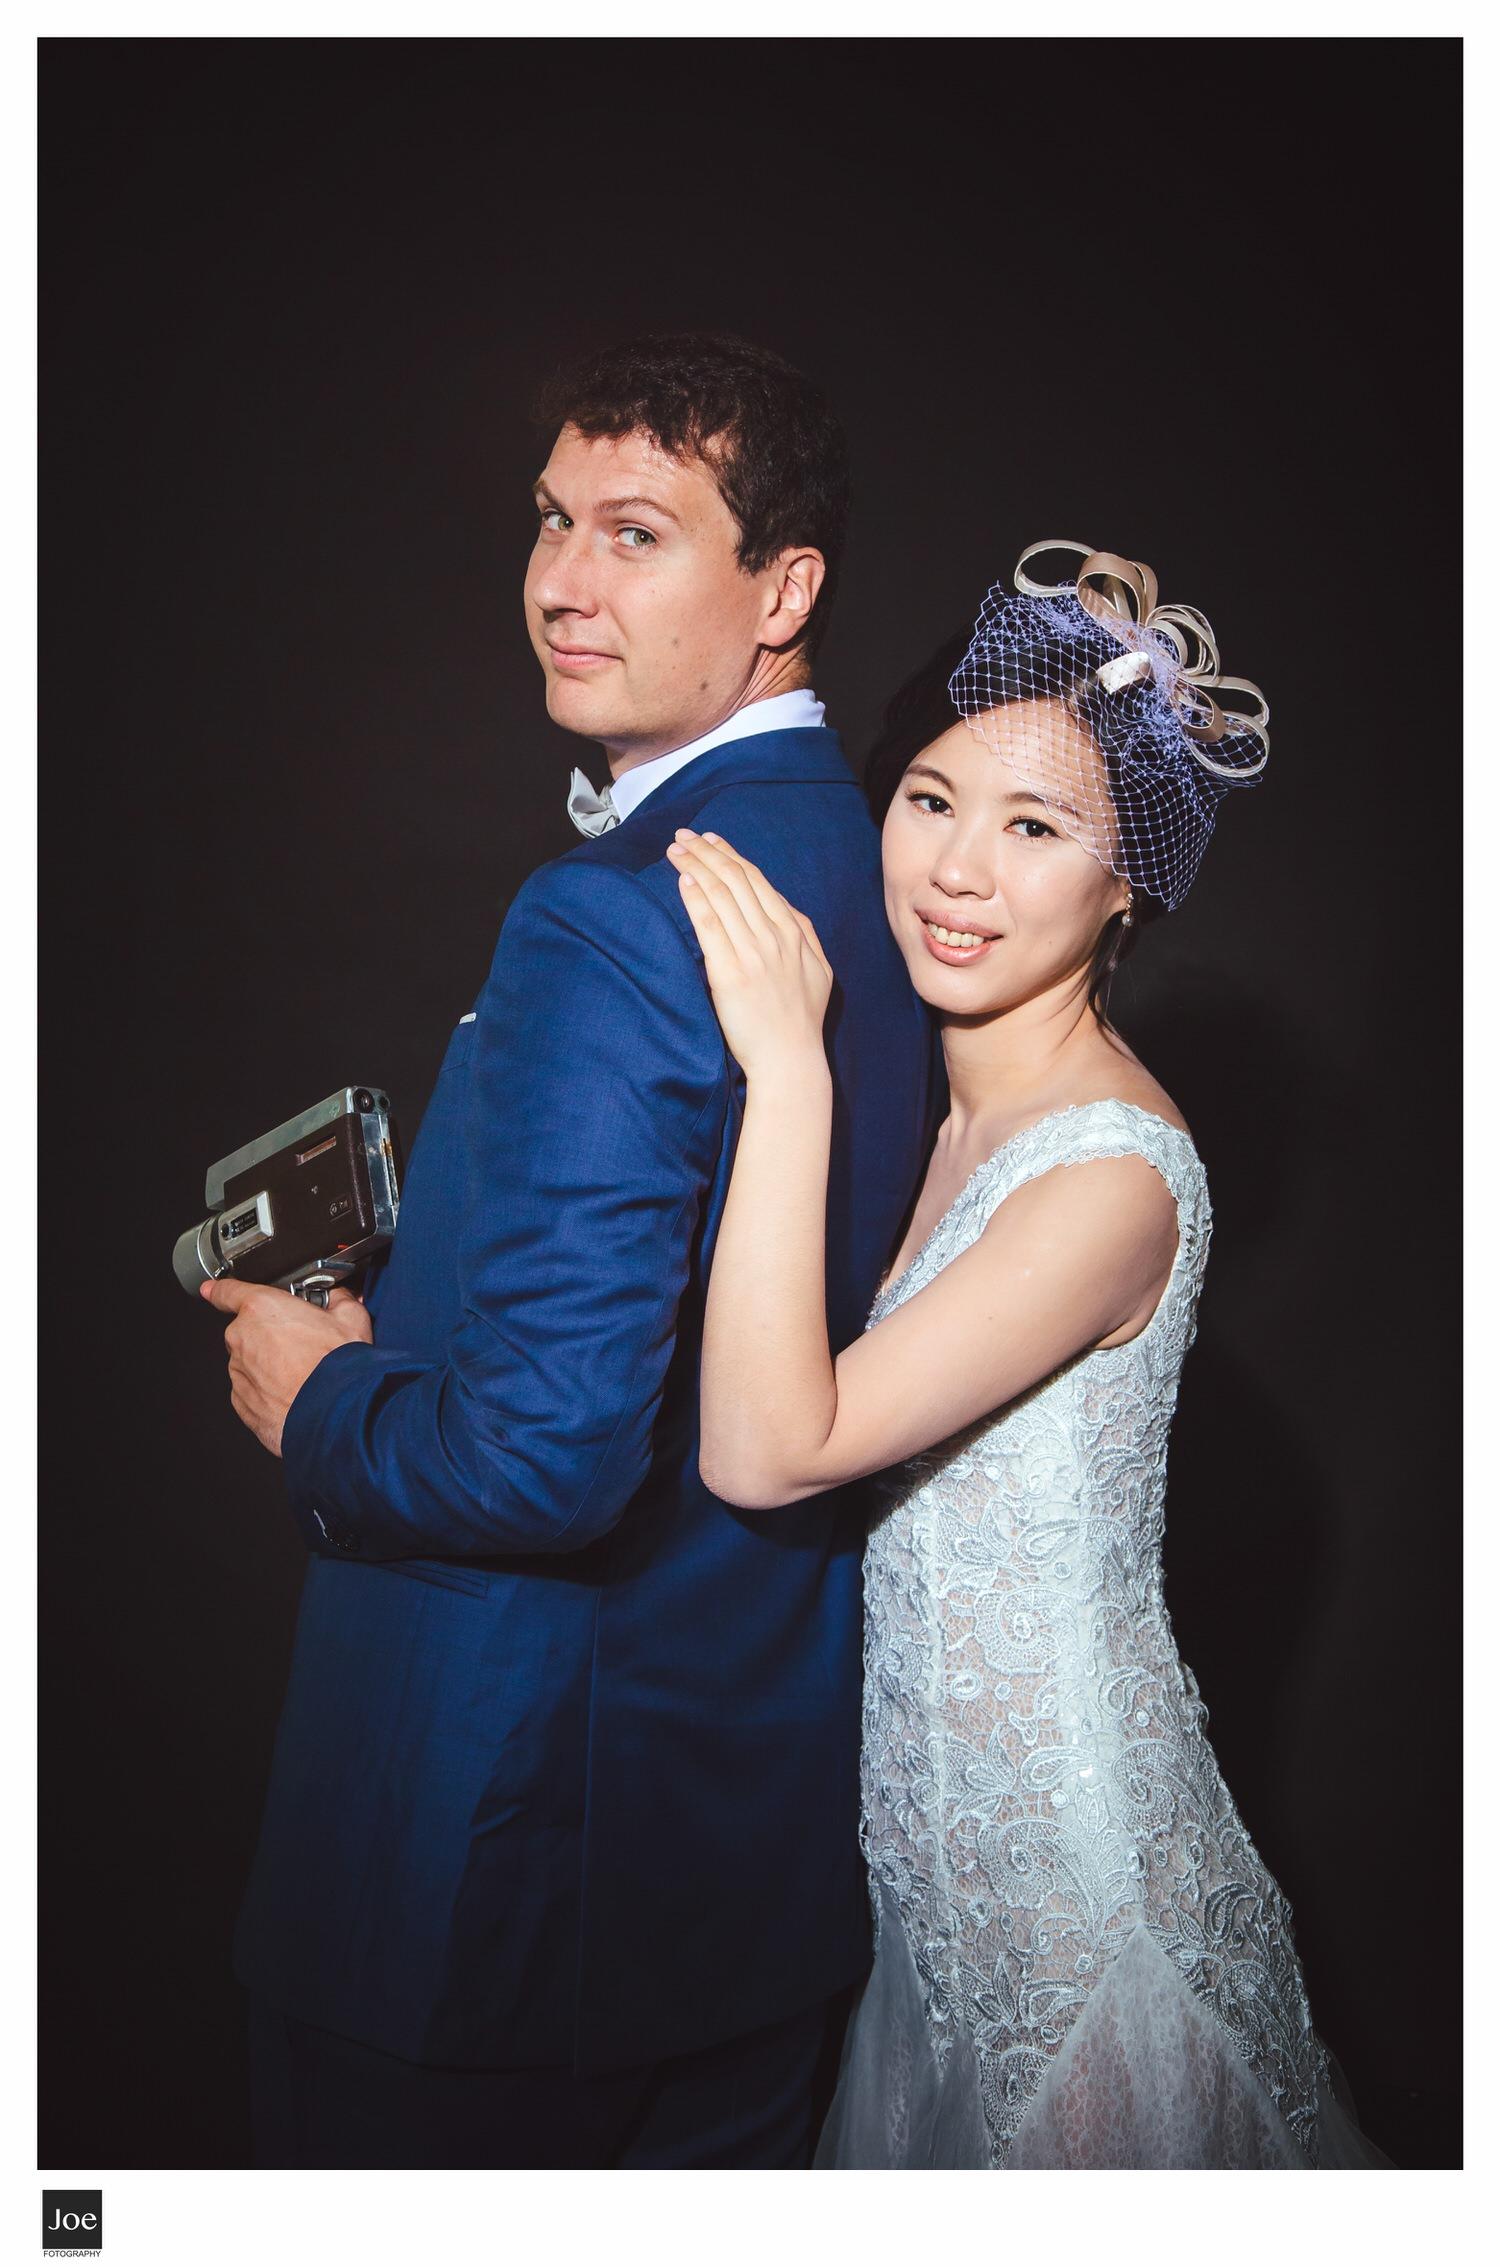 joe-fotography-pre-wedding-kay-jeff-010.jpg